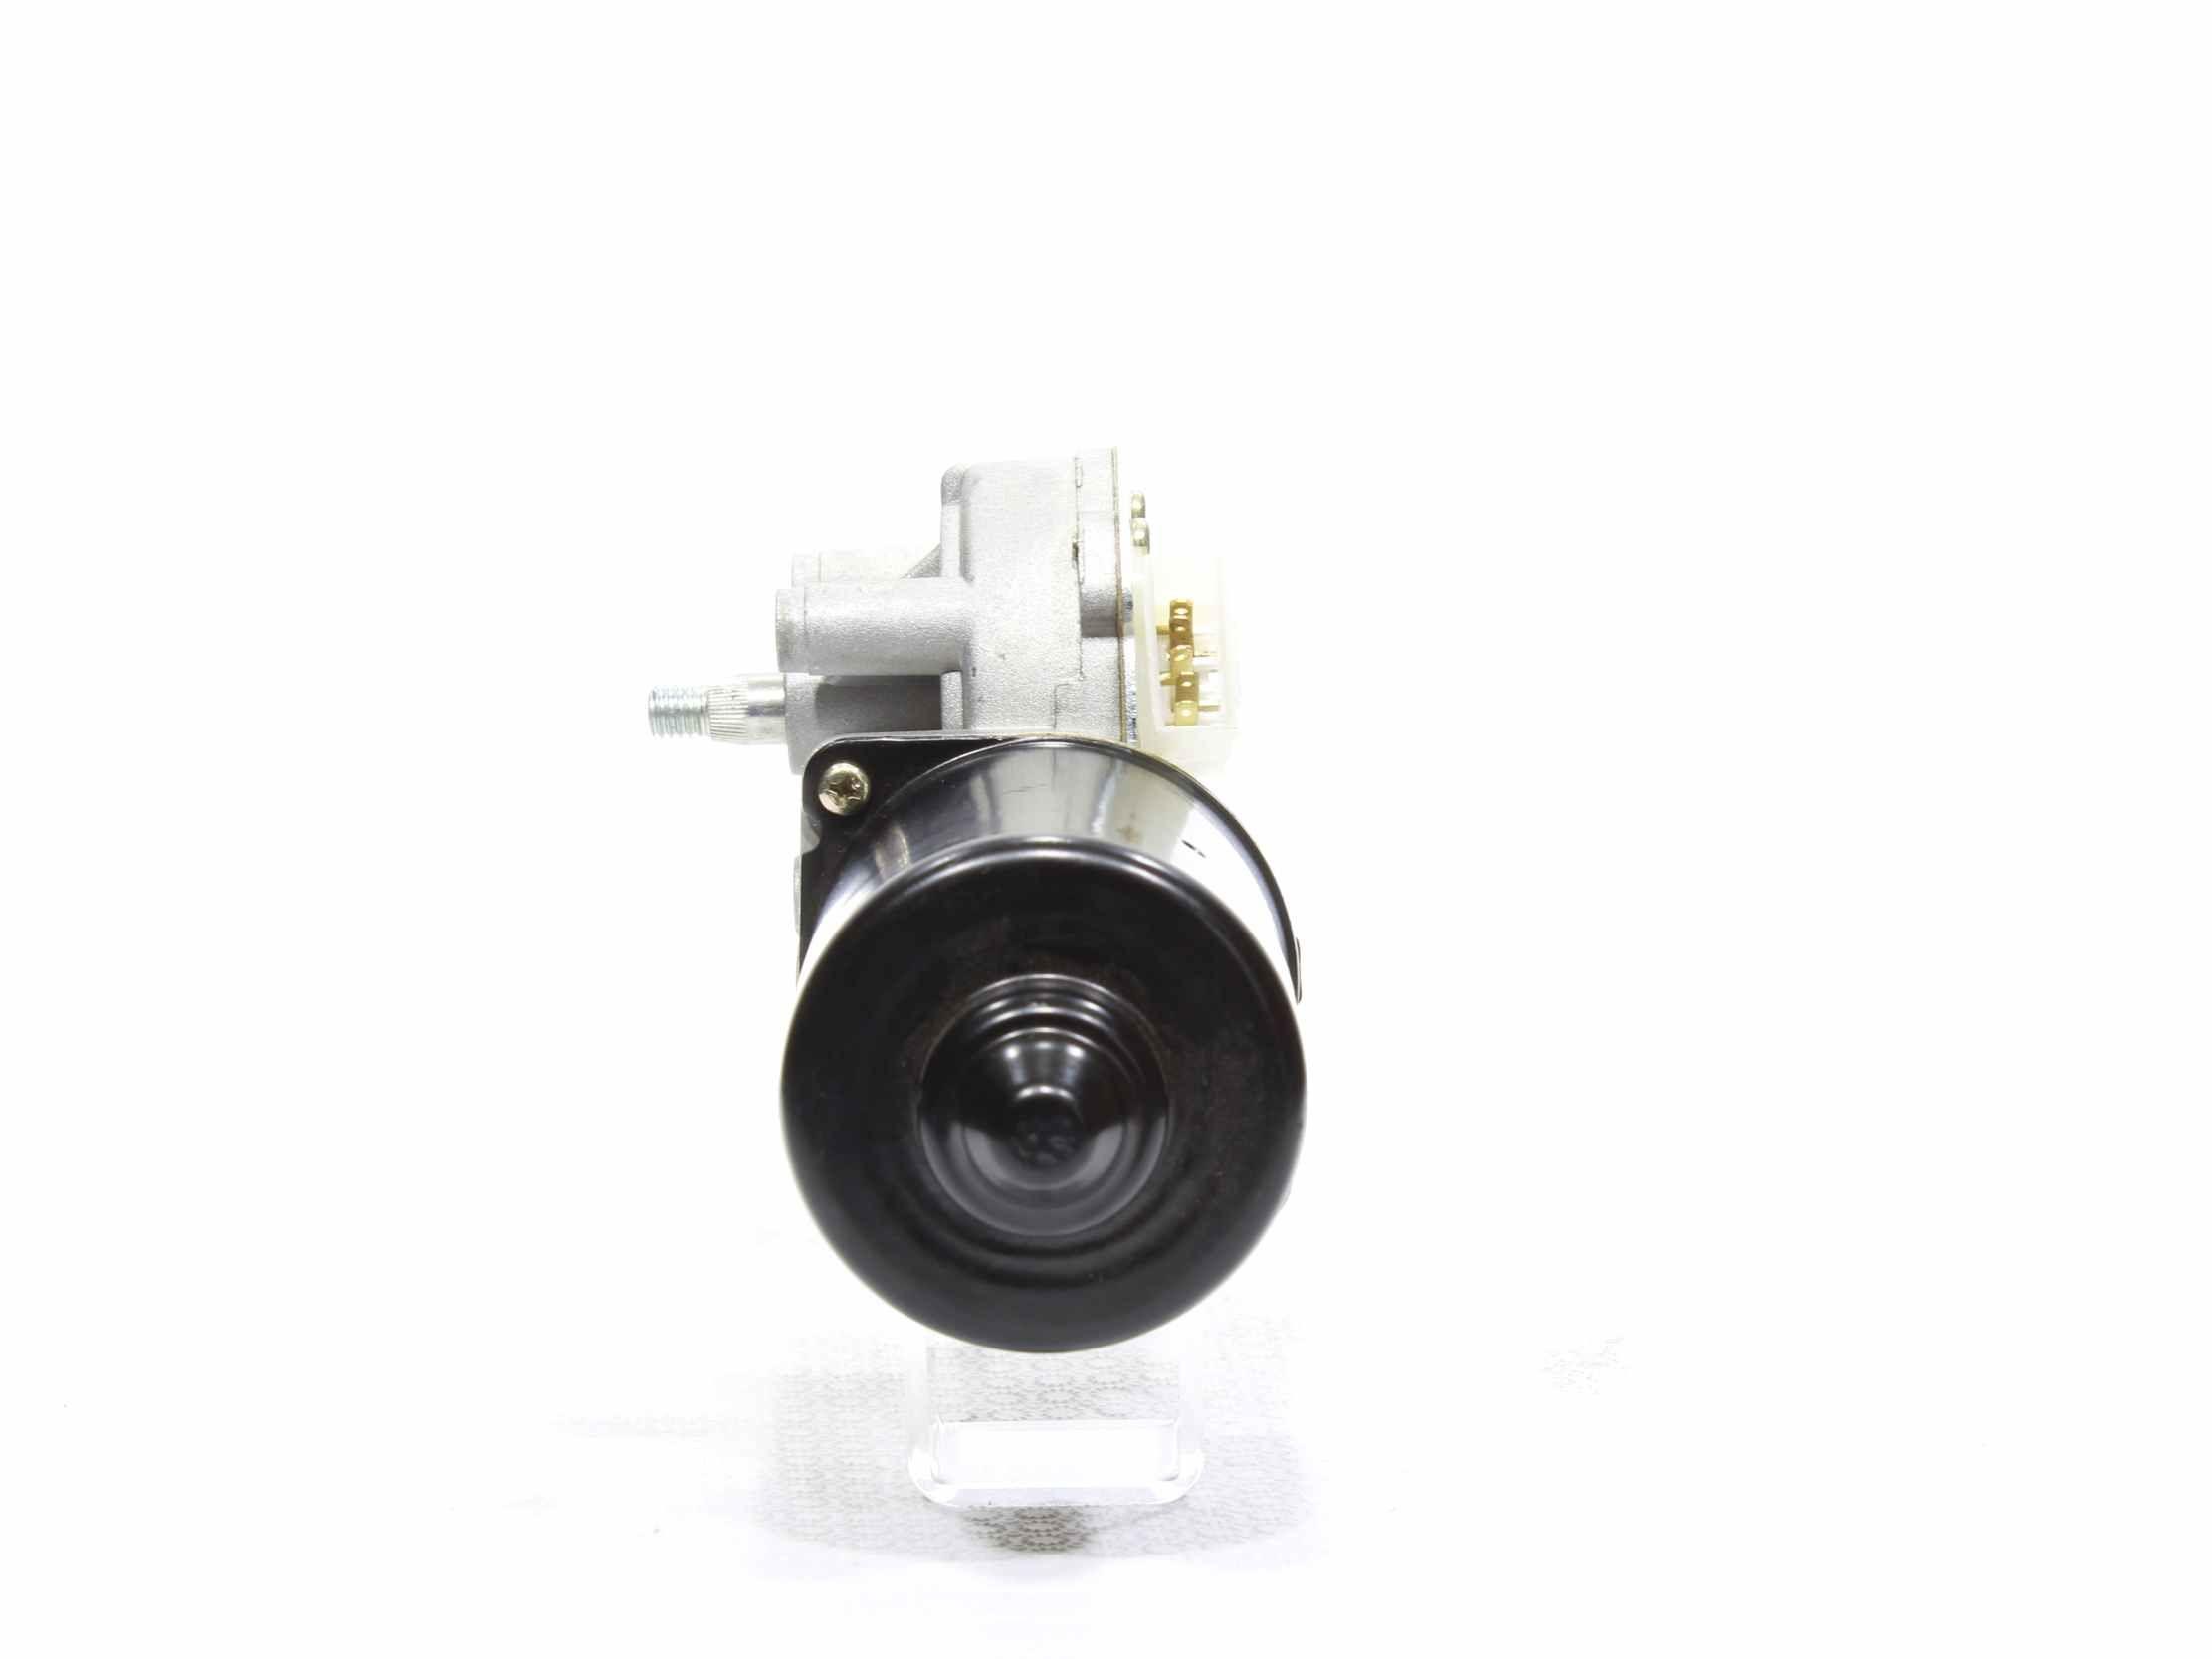 Windscreen Wiper Motor ALANKO 10800010 rating